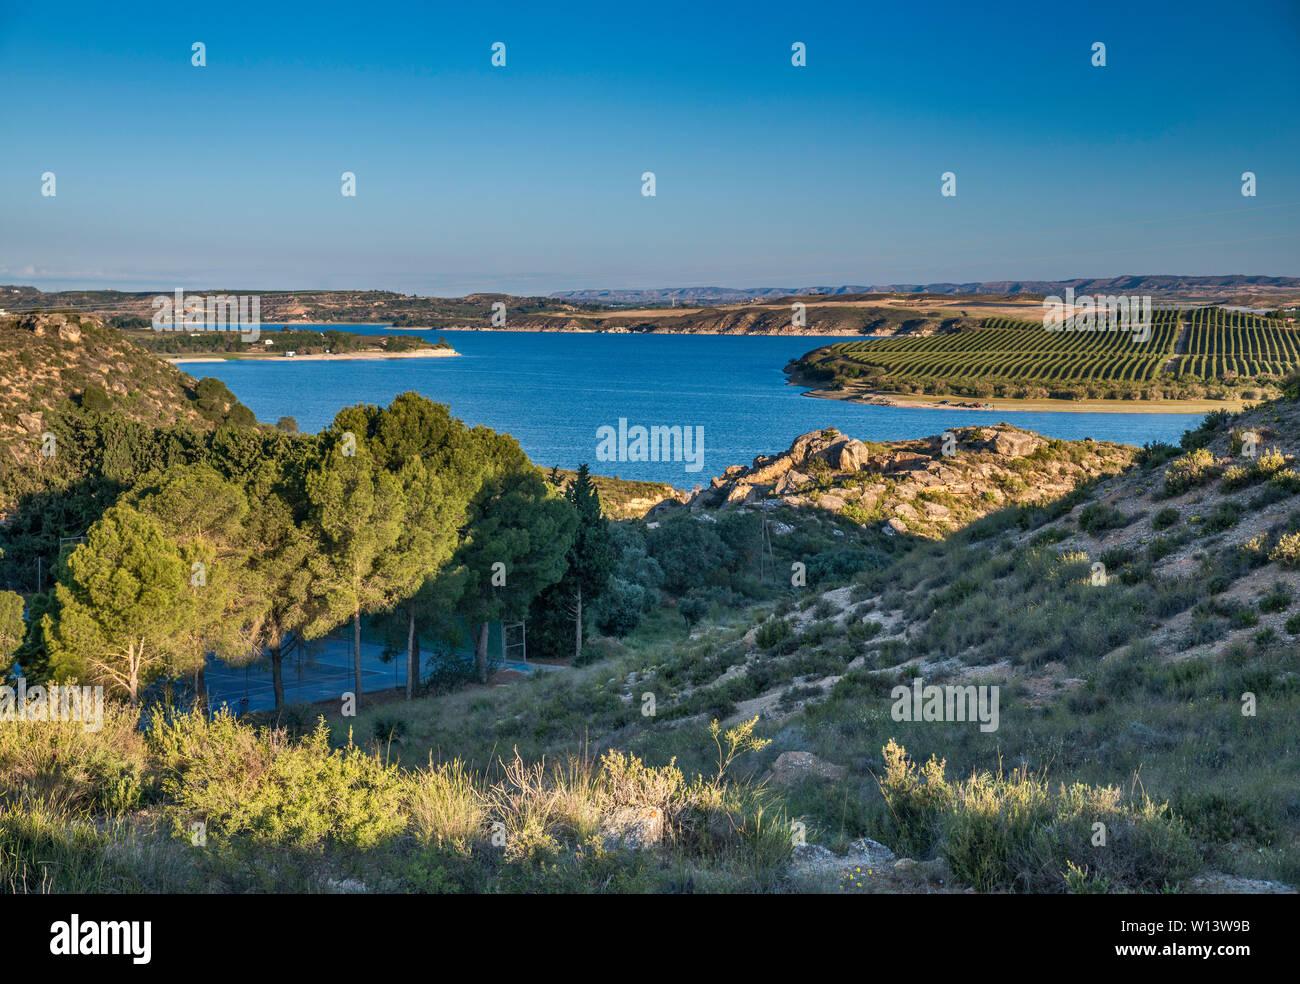 Embalse de Mequinenza (Mar de Aragón) reservoir on Ebro river near town of Ebro, Zaragoza province, Aragon, Spain Stock Photo